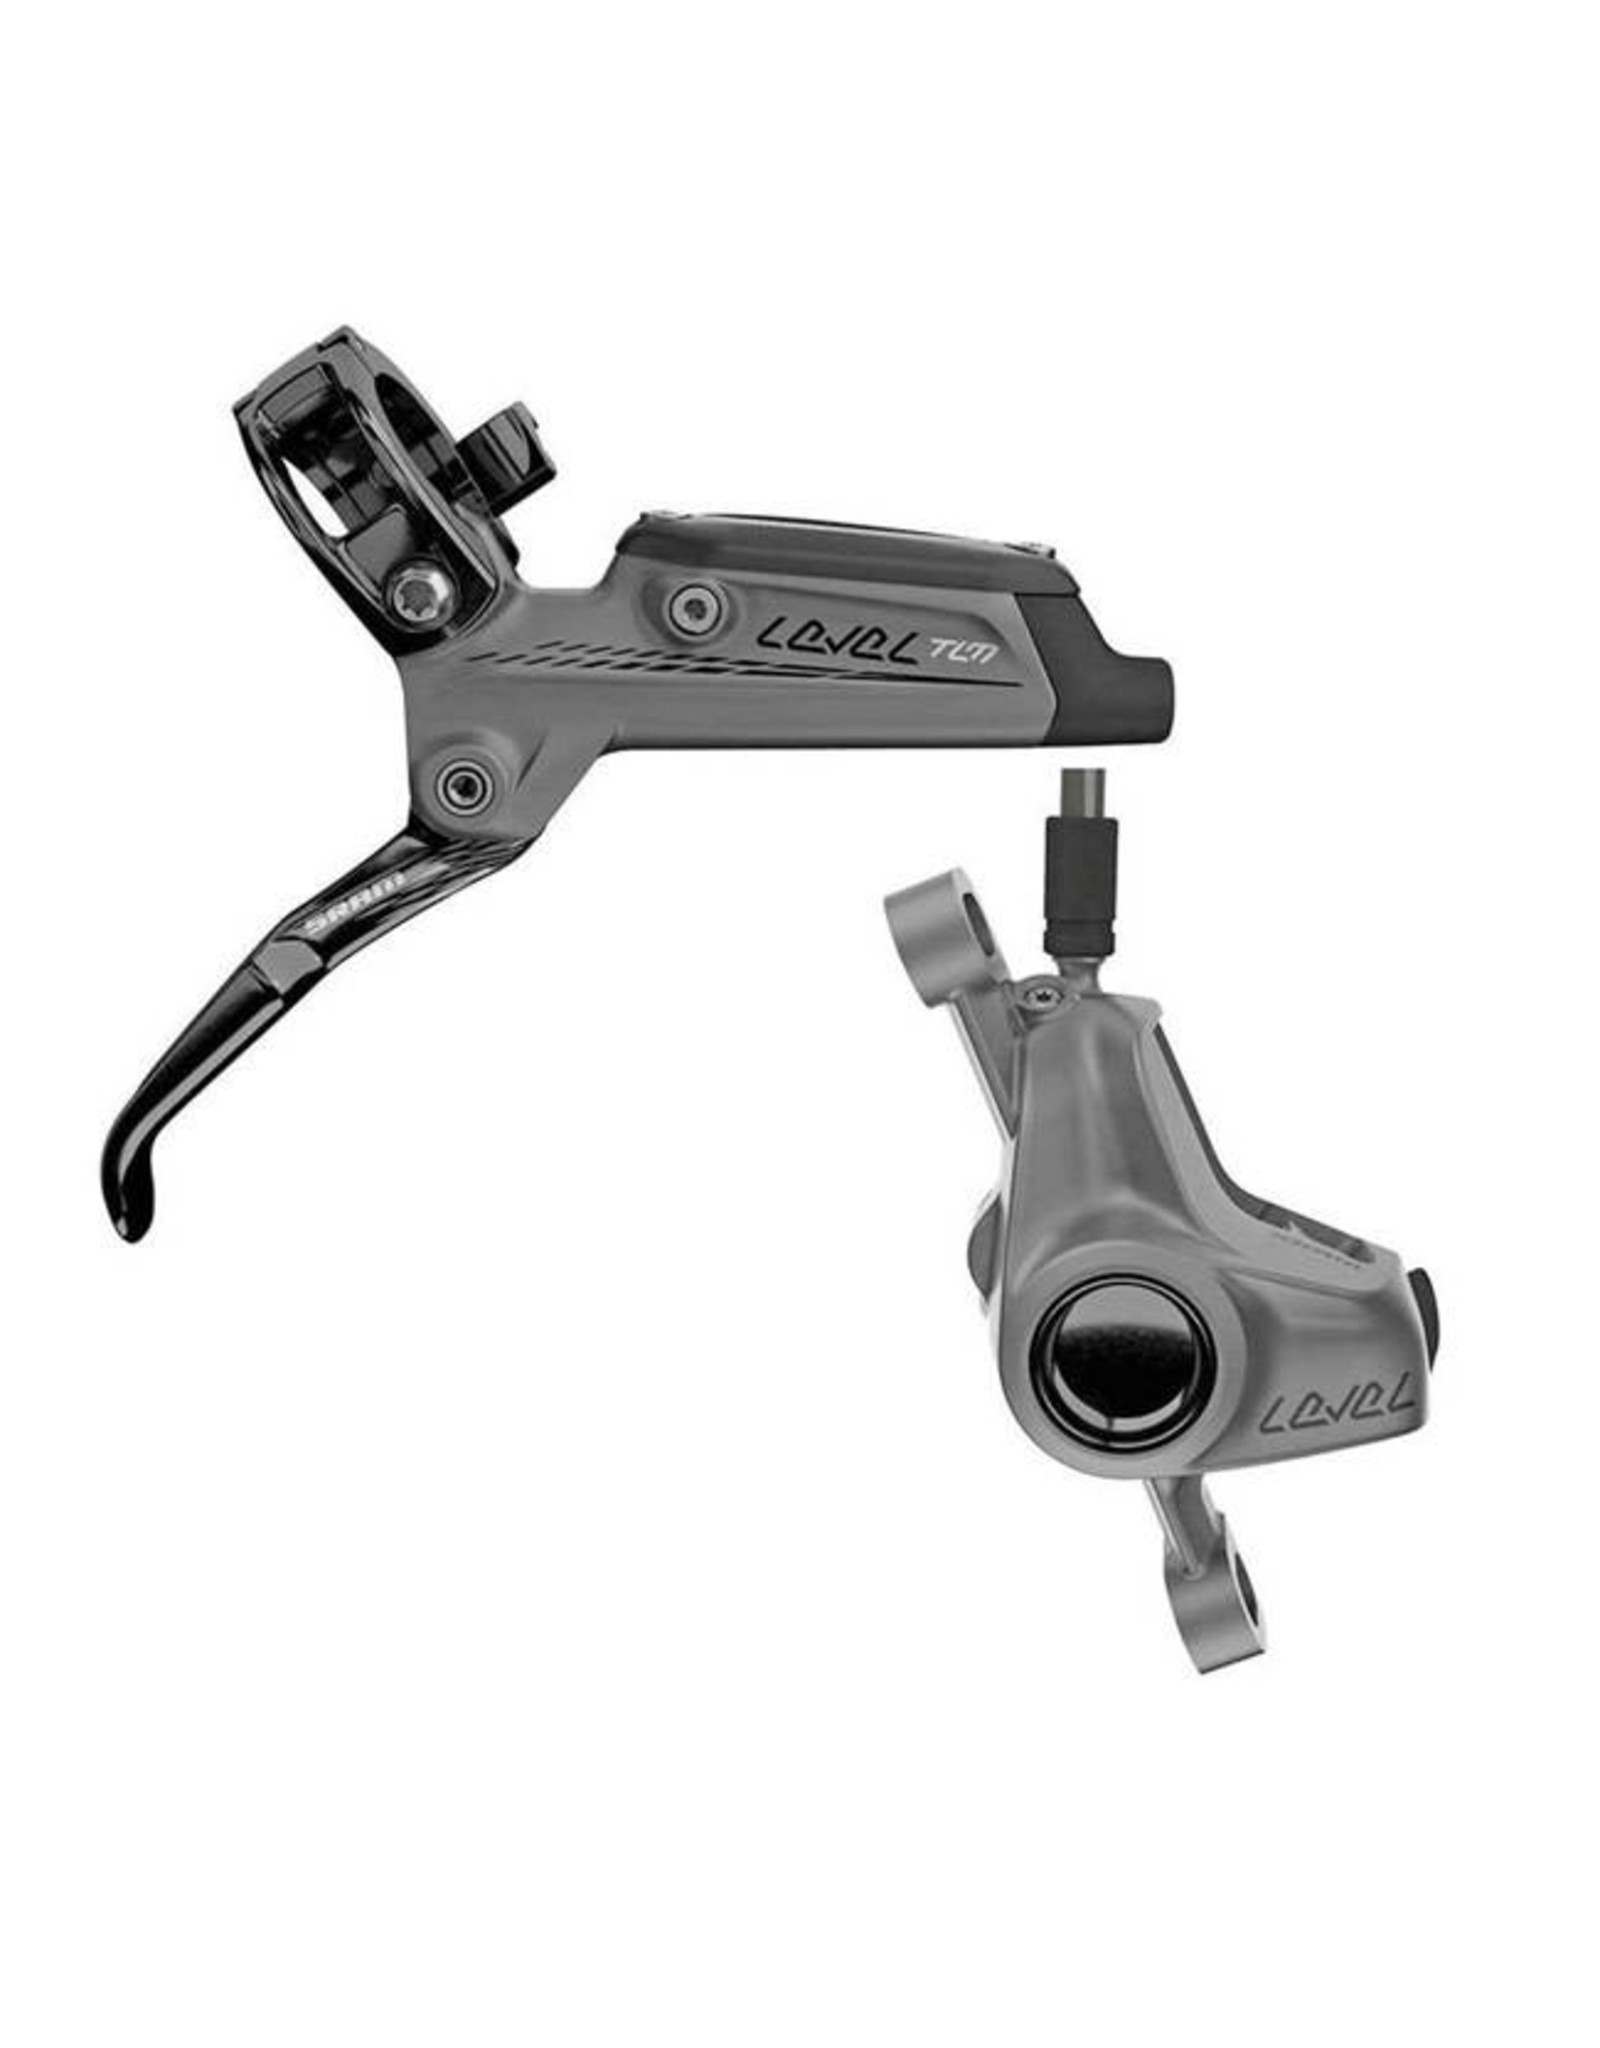 SRAM SRAM Level TLM Disc Brake Rear 1800mm Hose Gray, Rotor/Bracket Sold Separately A1